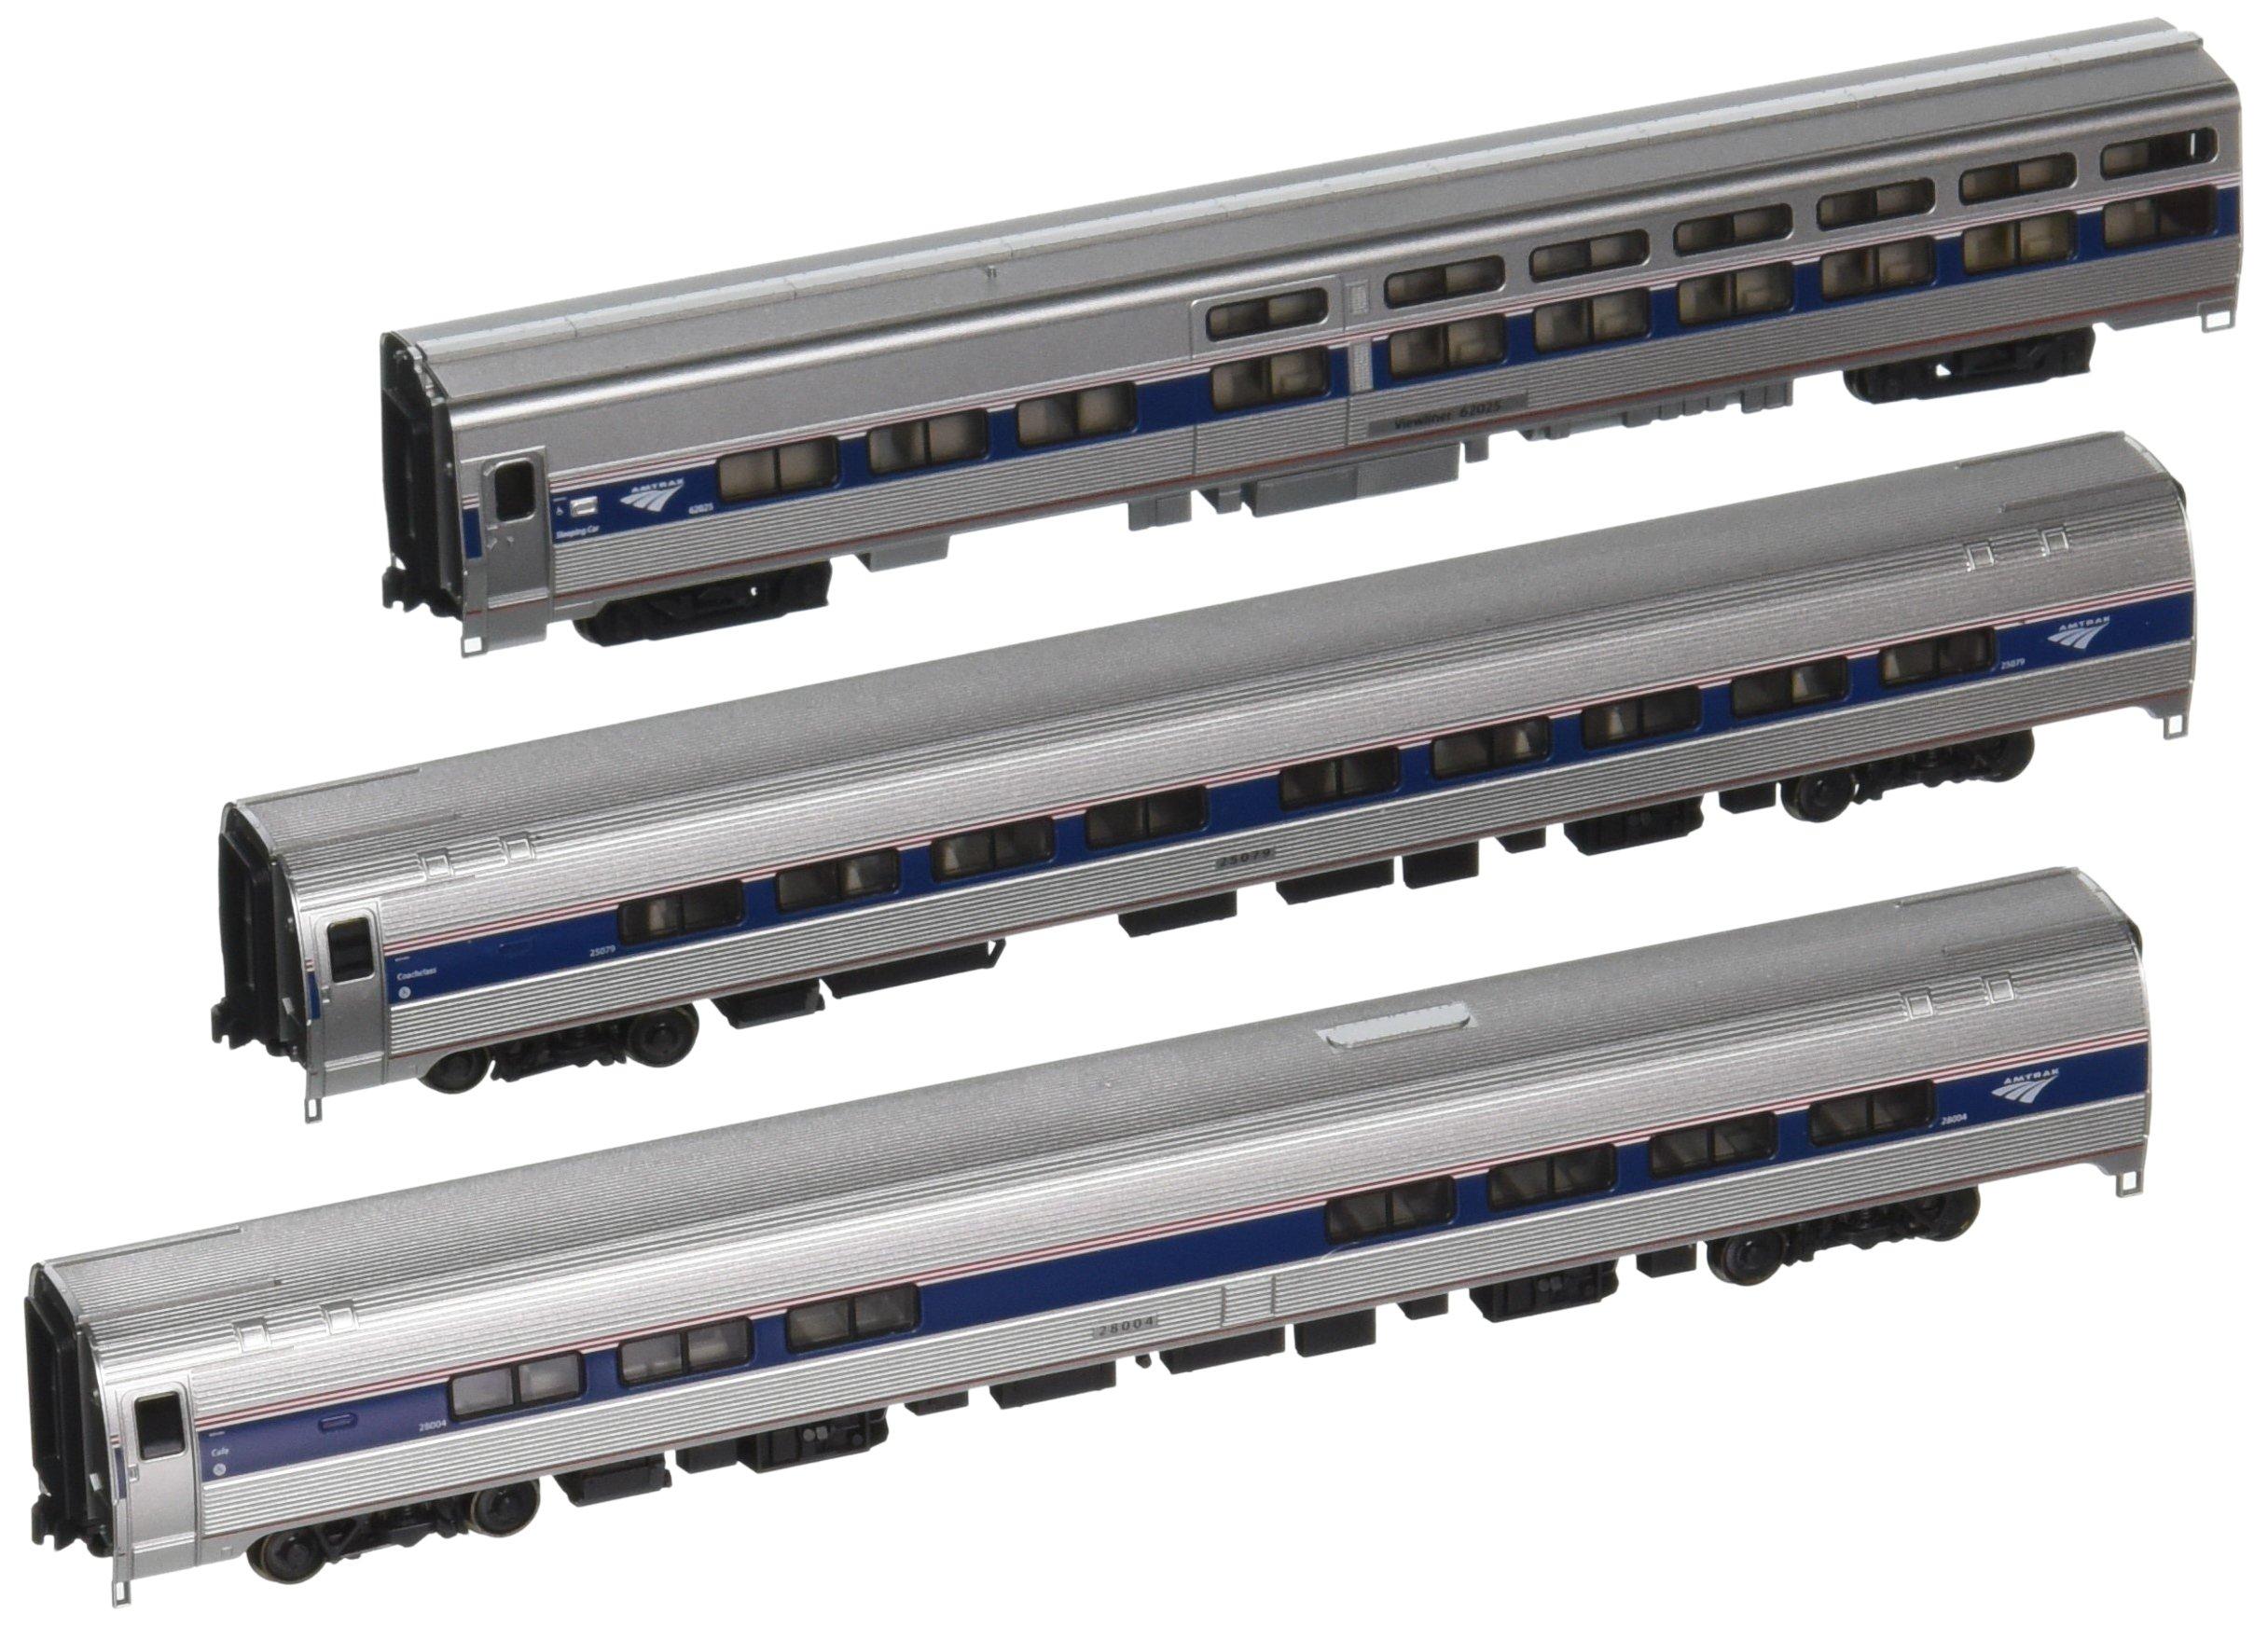 Kato USA Model Train Products Amfleet and Viewliner Intercity Express Phase VI Bookcase Set, 3-Unit Set